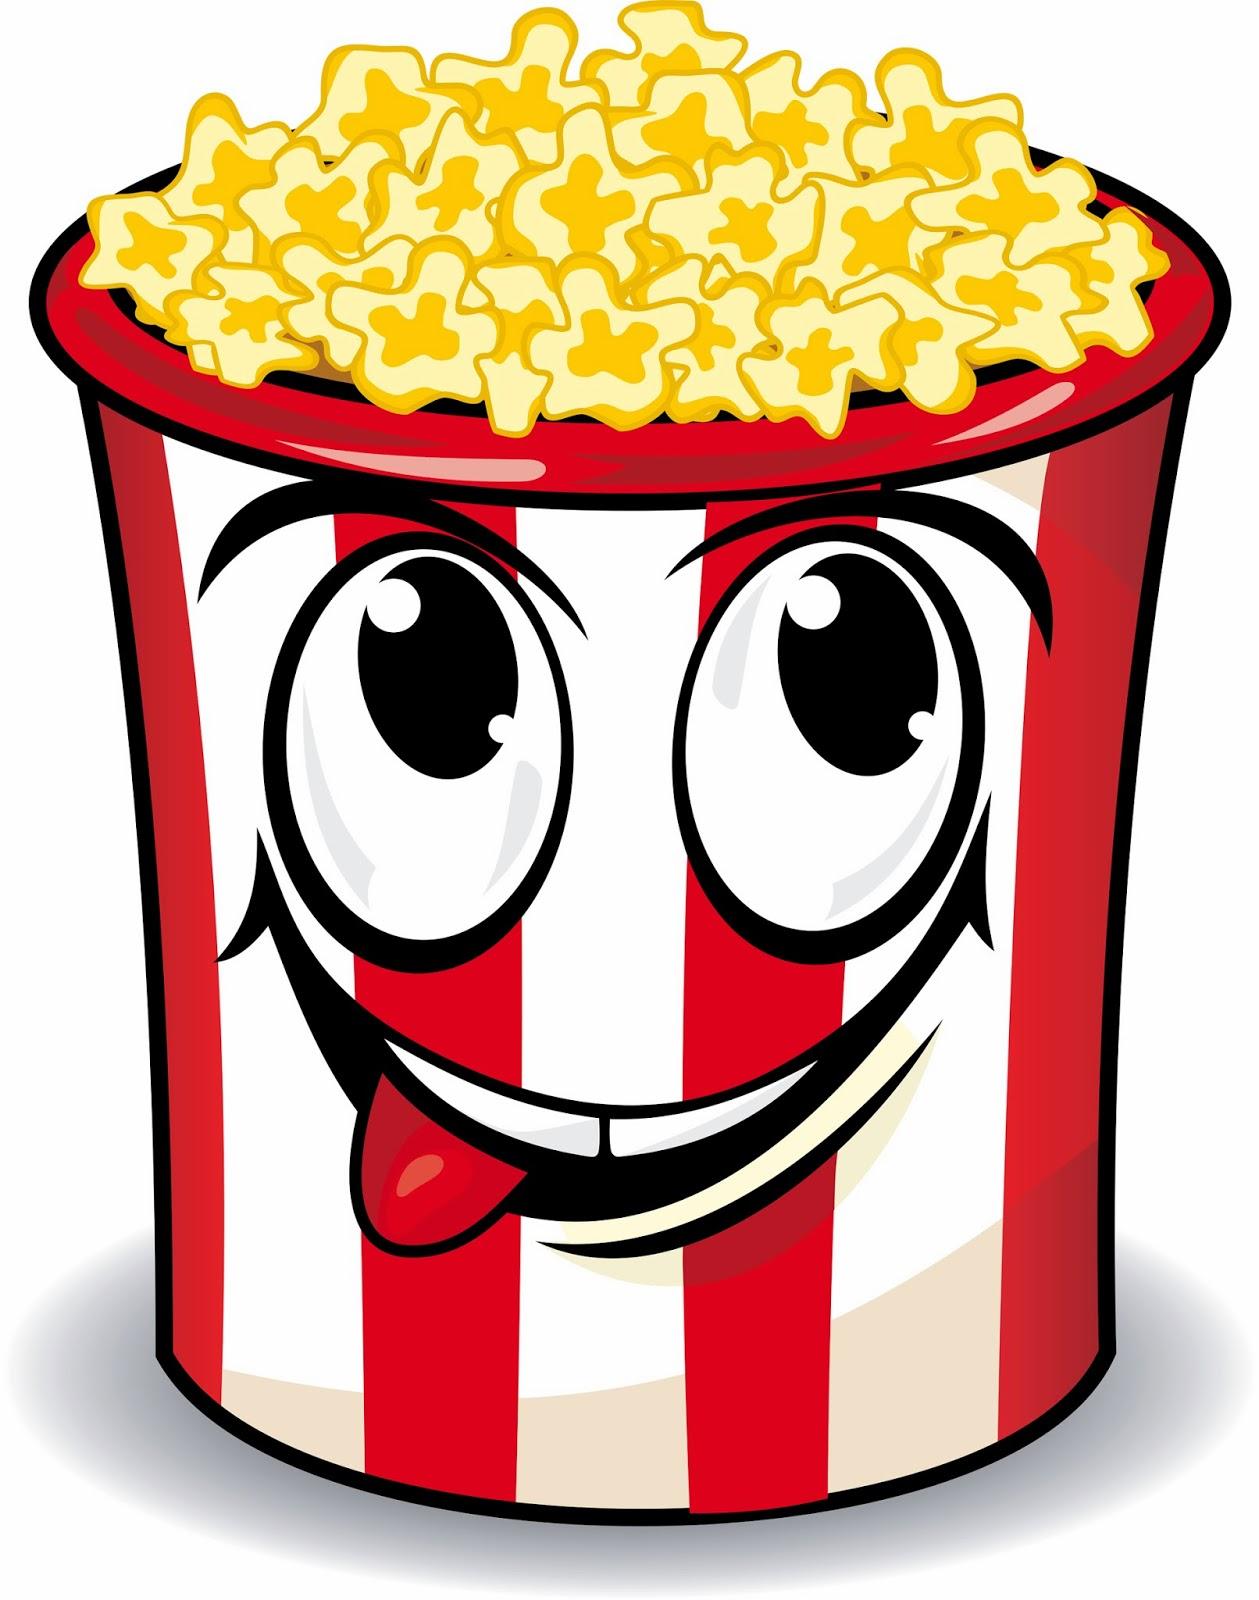 Free popcorn clipart 5.